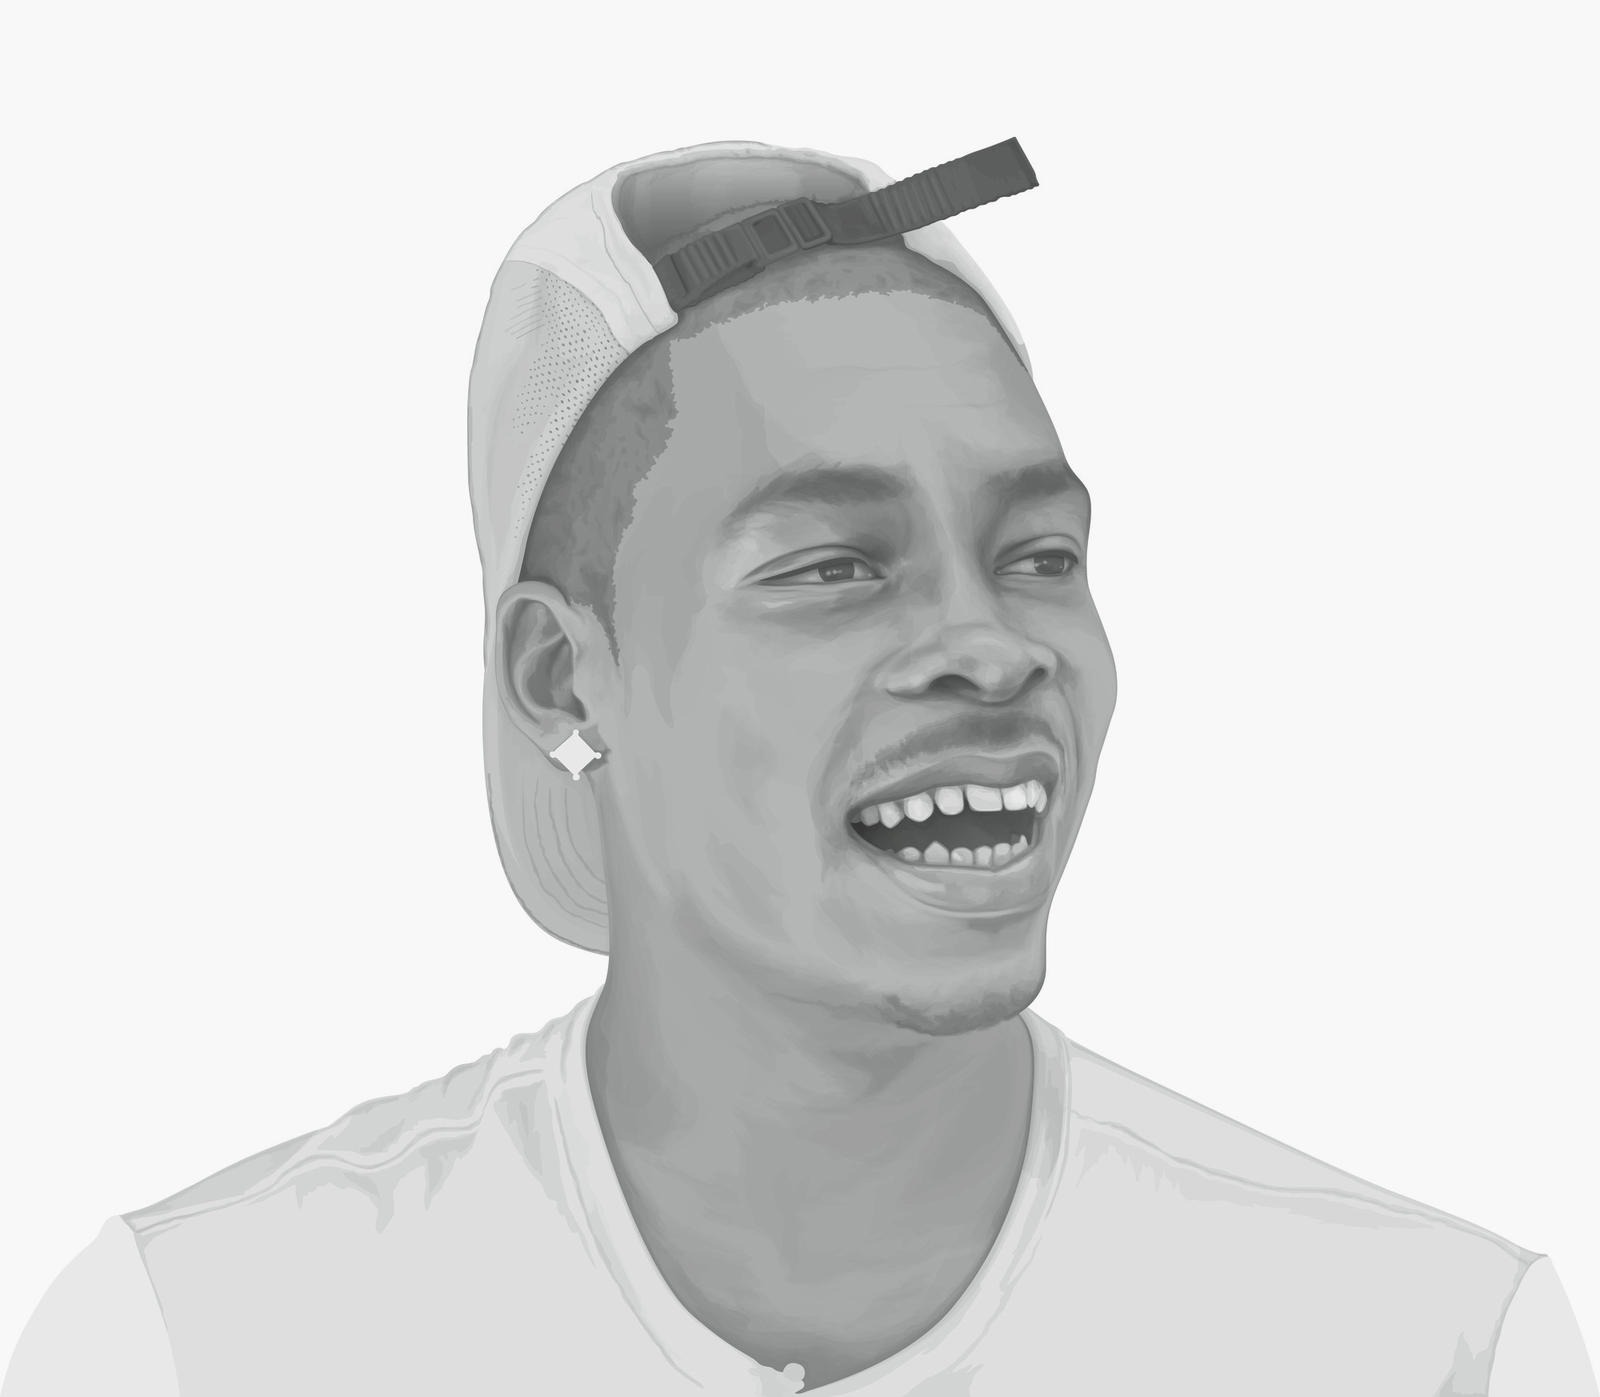 -Nike-TheotisBeasley-portrait-R3